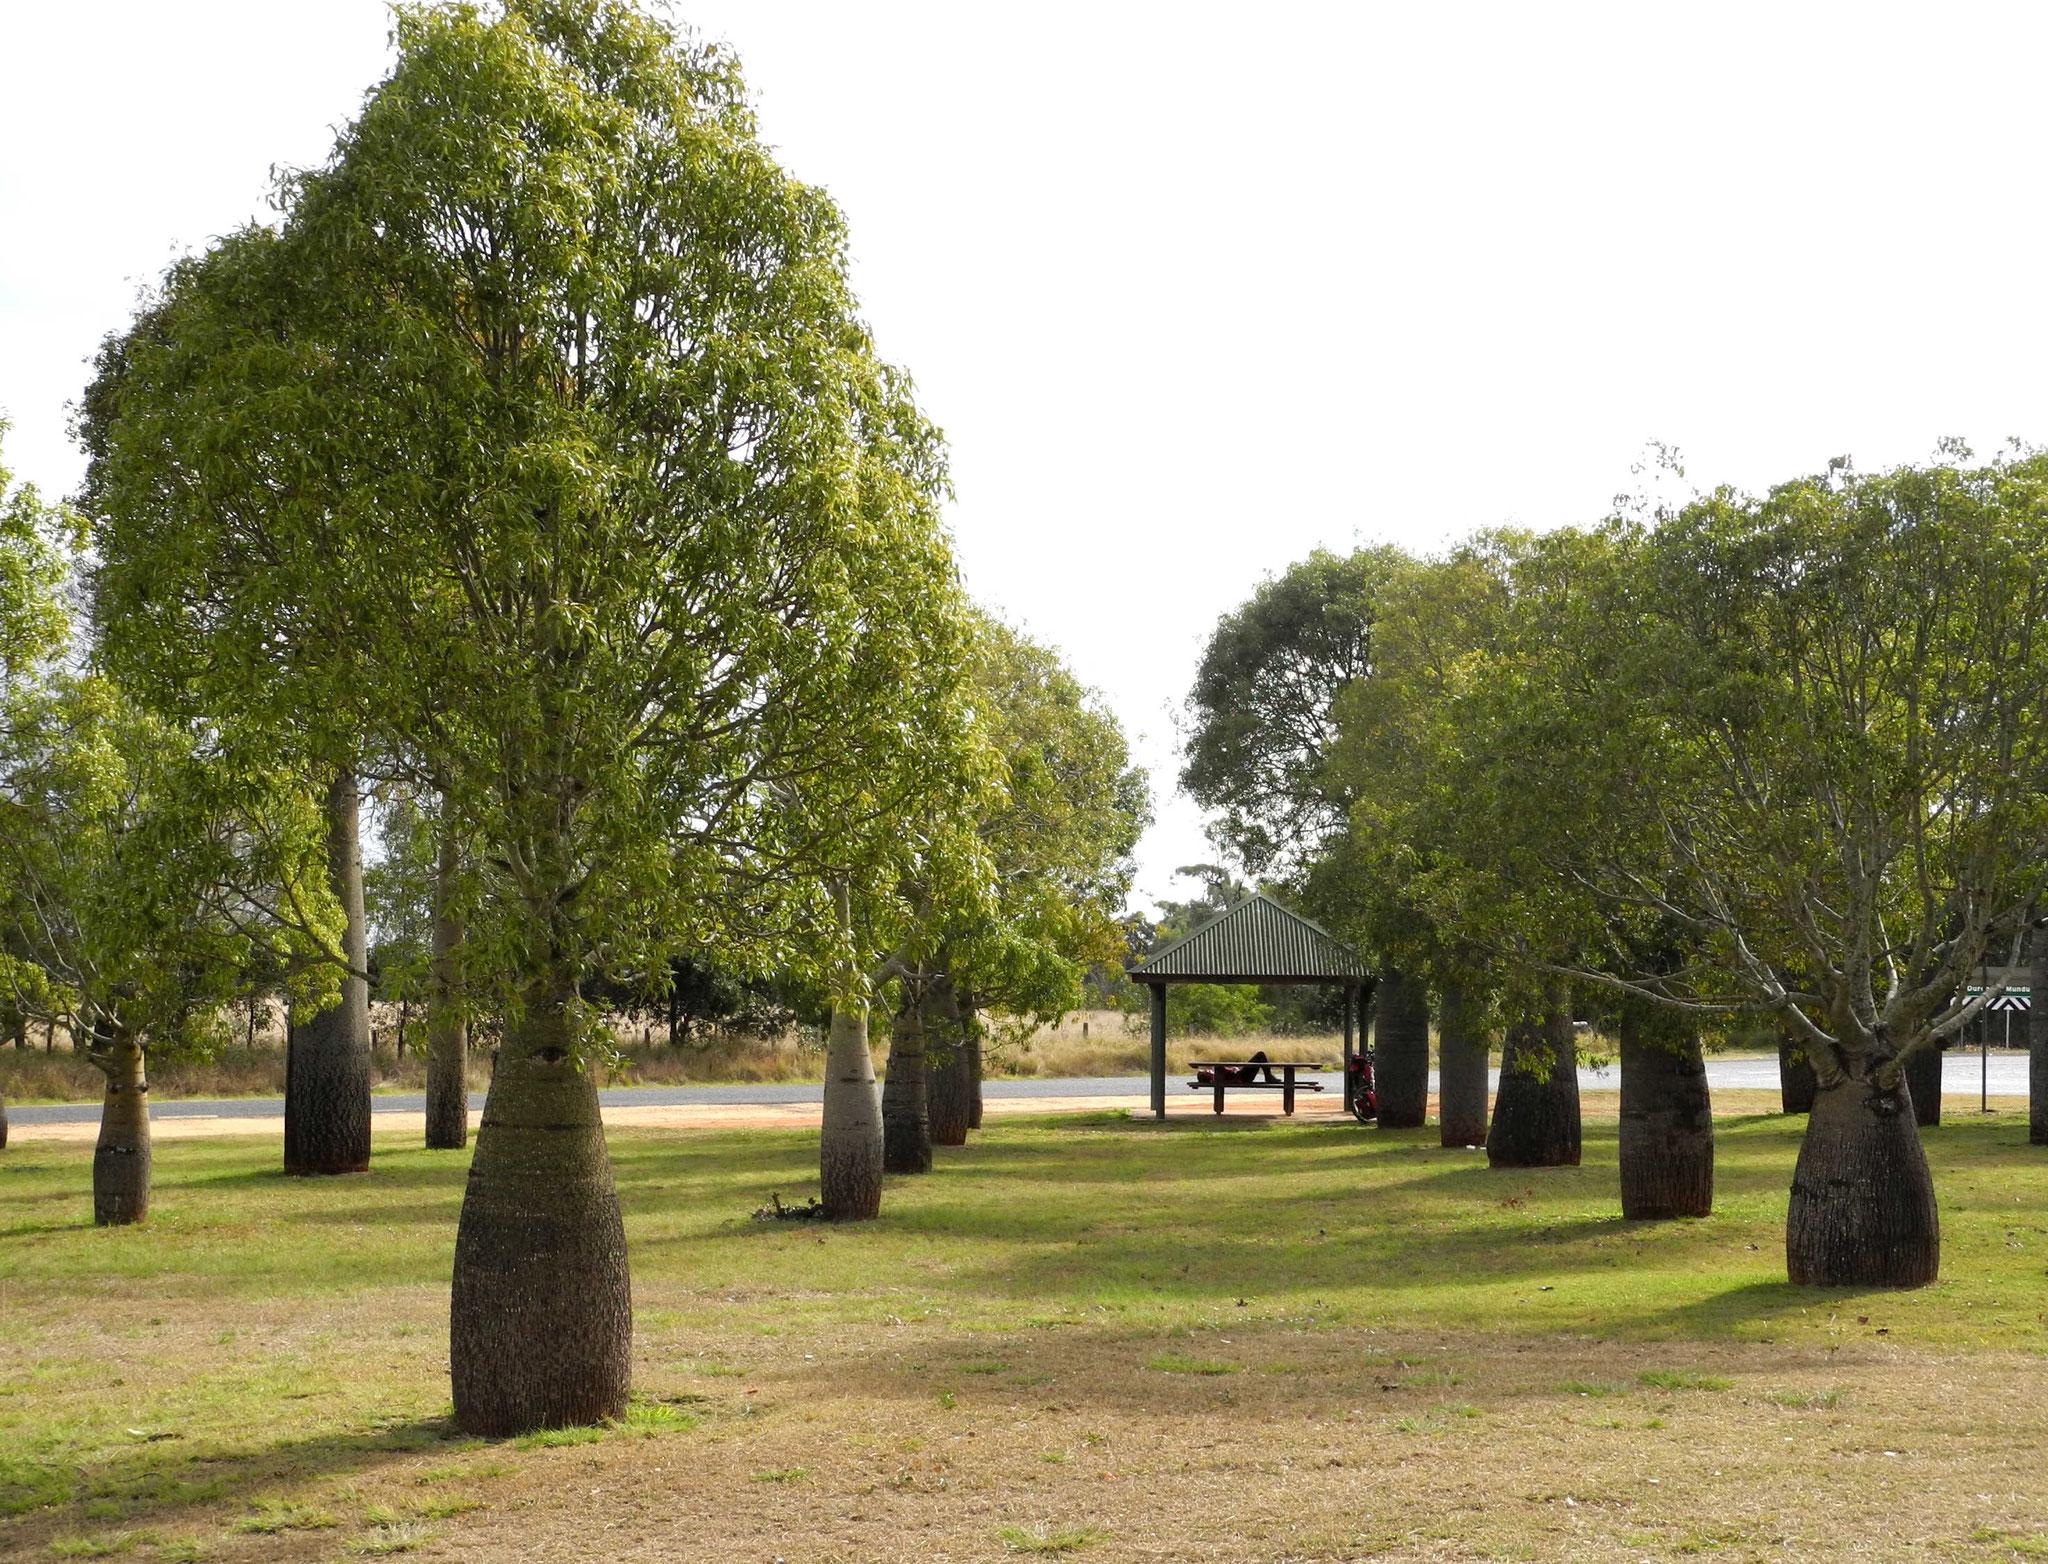 Bottletrees - Flaschenbäume